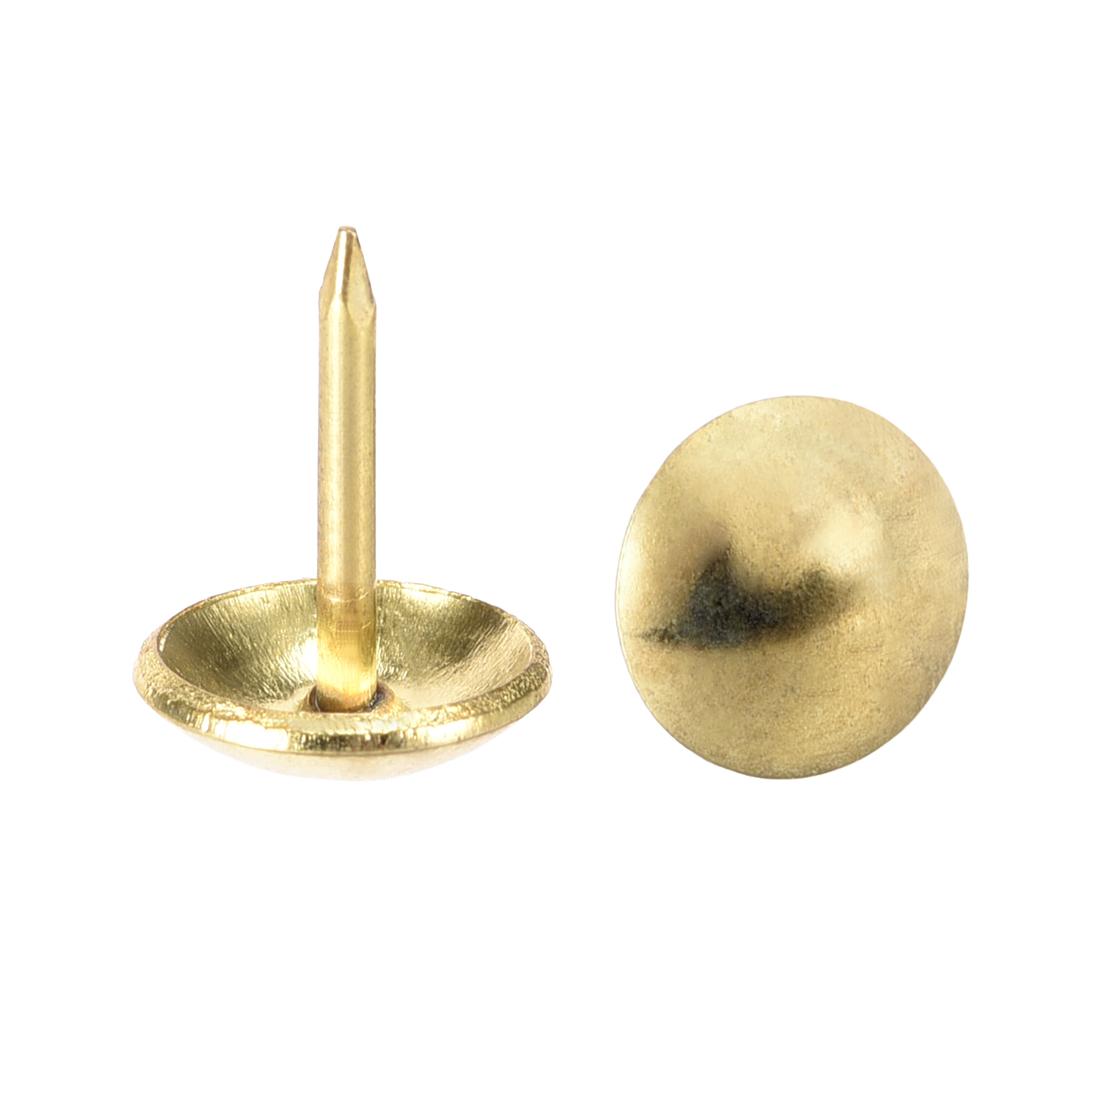 Upholstery Nails Tacks 10mm Dia 11mm Height Round Push Pins Gold Tone 50 Pcs